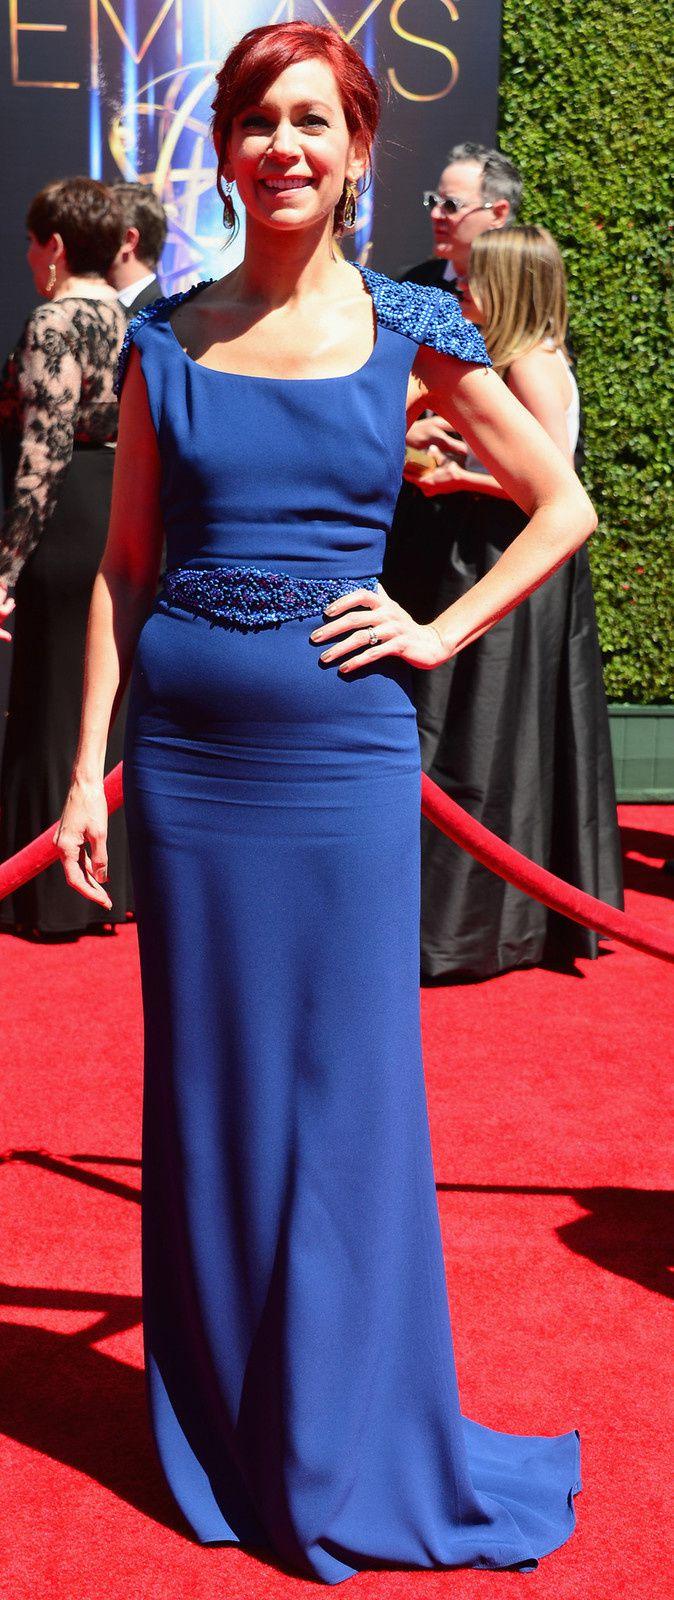 Carrie Preston (True Blood, The Godd Wife) - © Getty